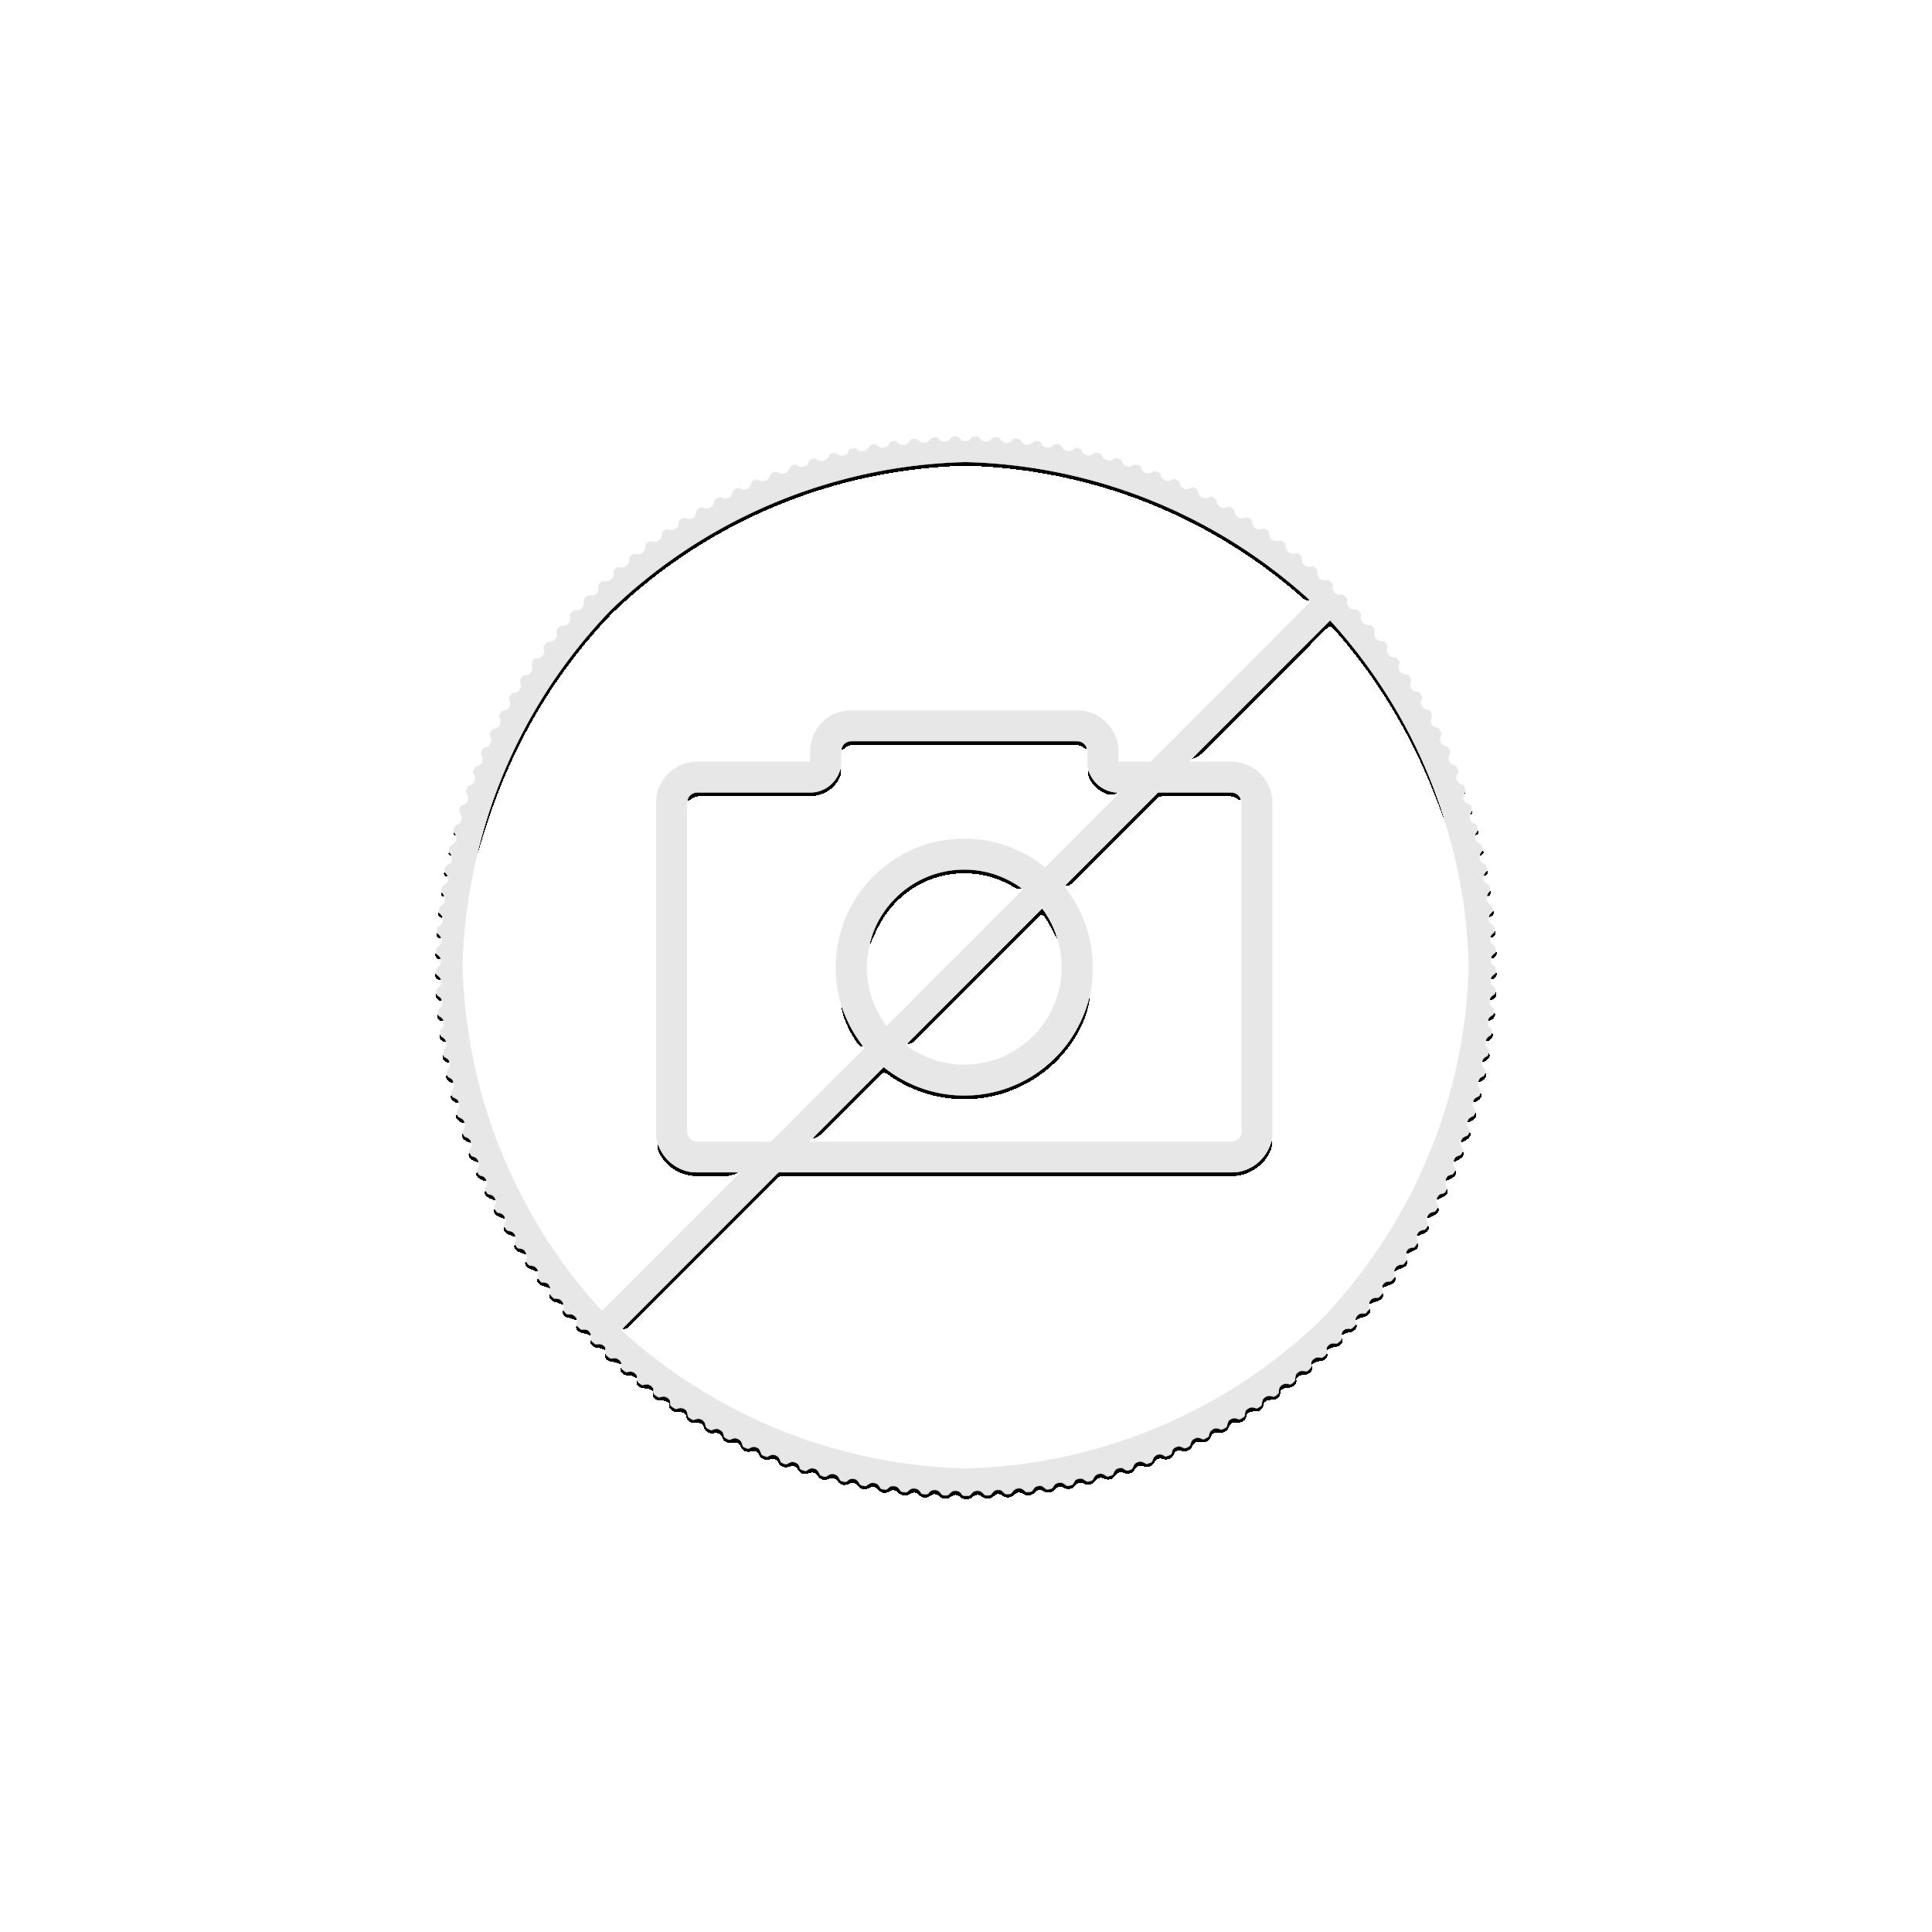 1 troy ounce zilveren munt Mr. Men little Miss-Mr. Happy 50th Anniversary 2021